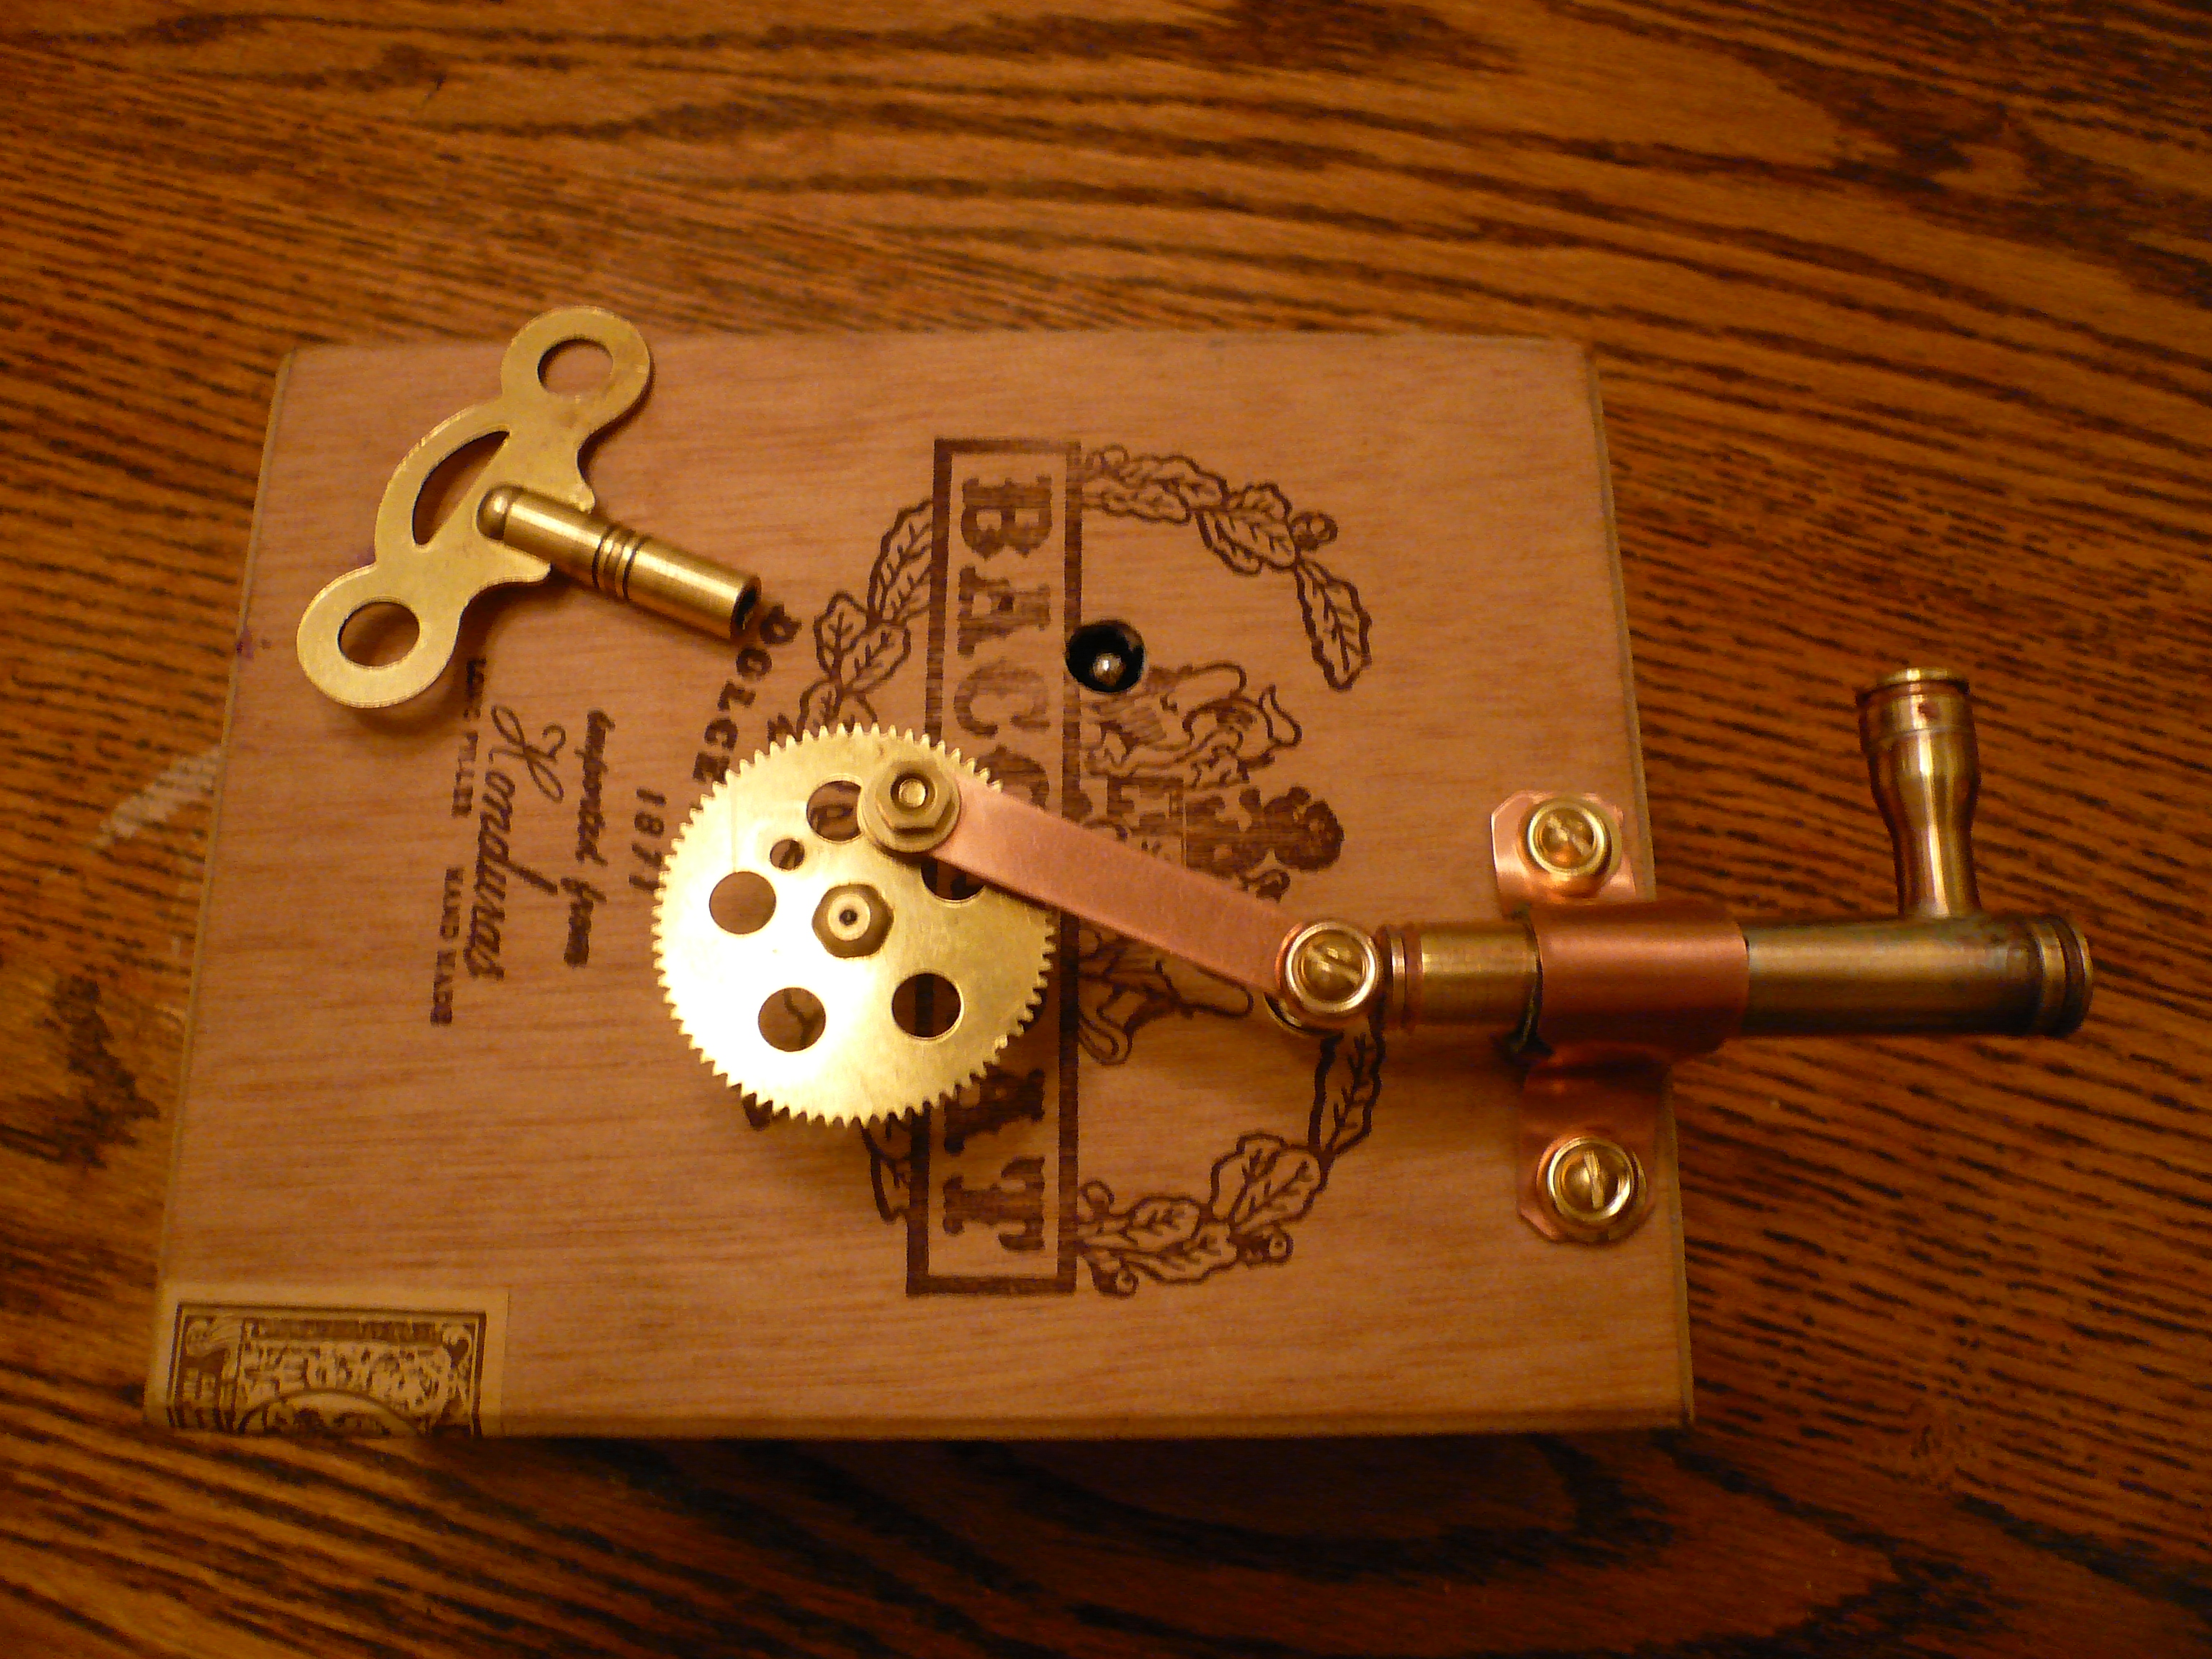 Clockwork Piston (Steampunk)